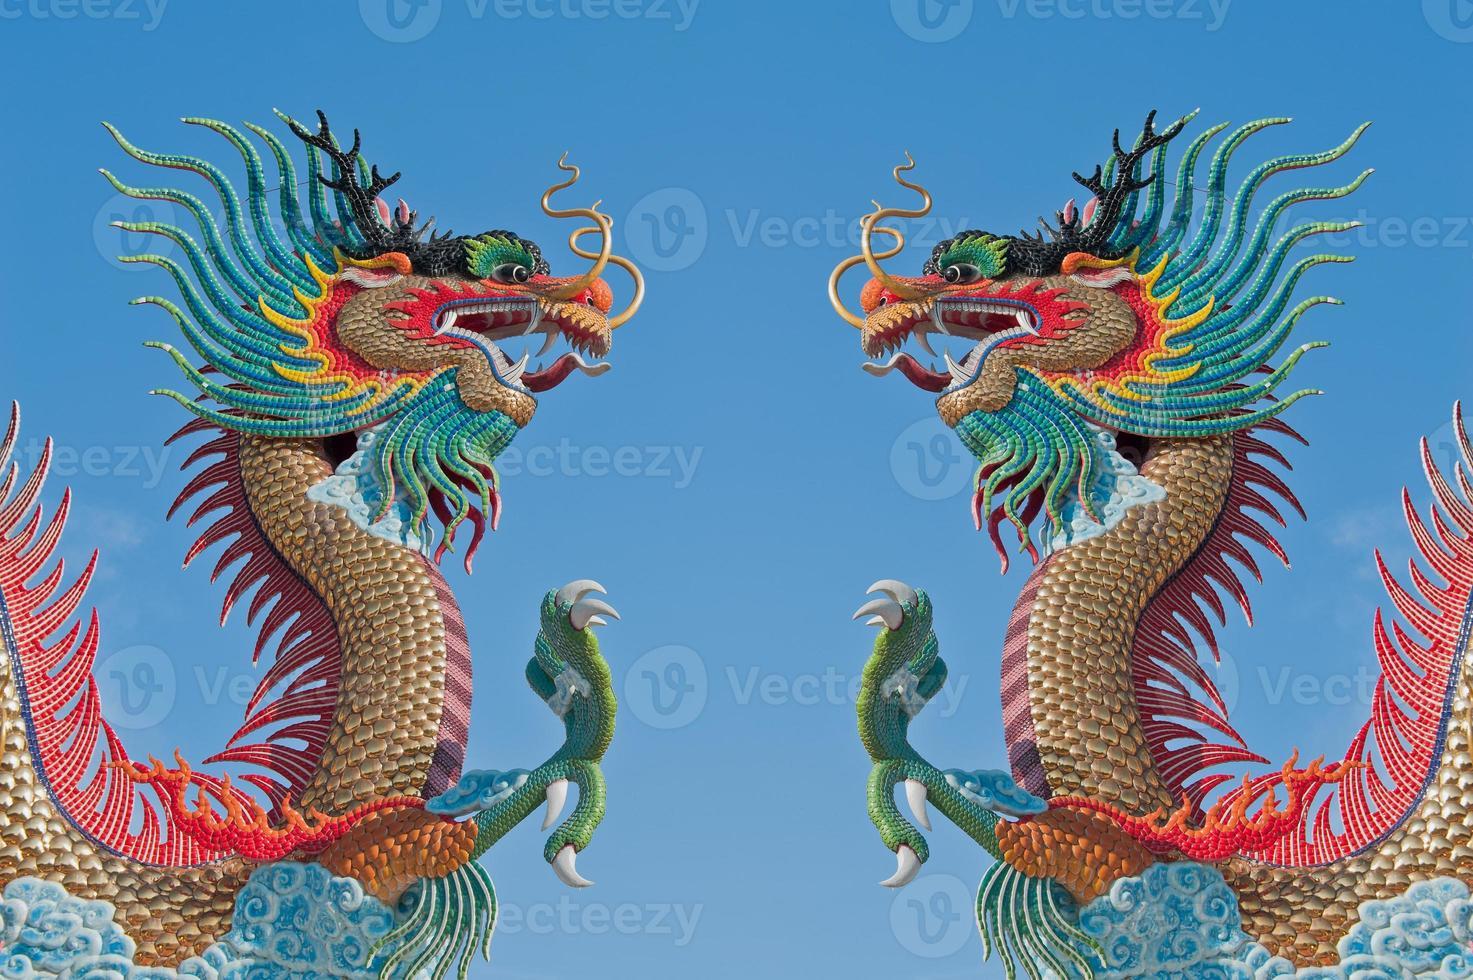 chinesischer Zwillingsdrache. foto